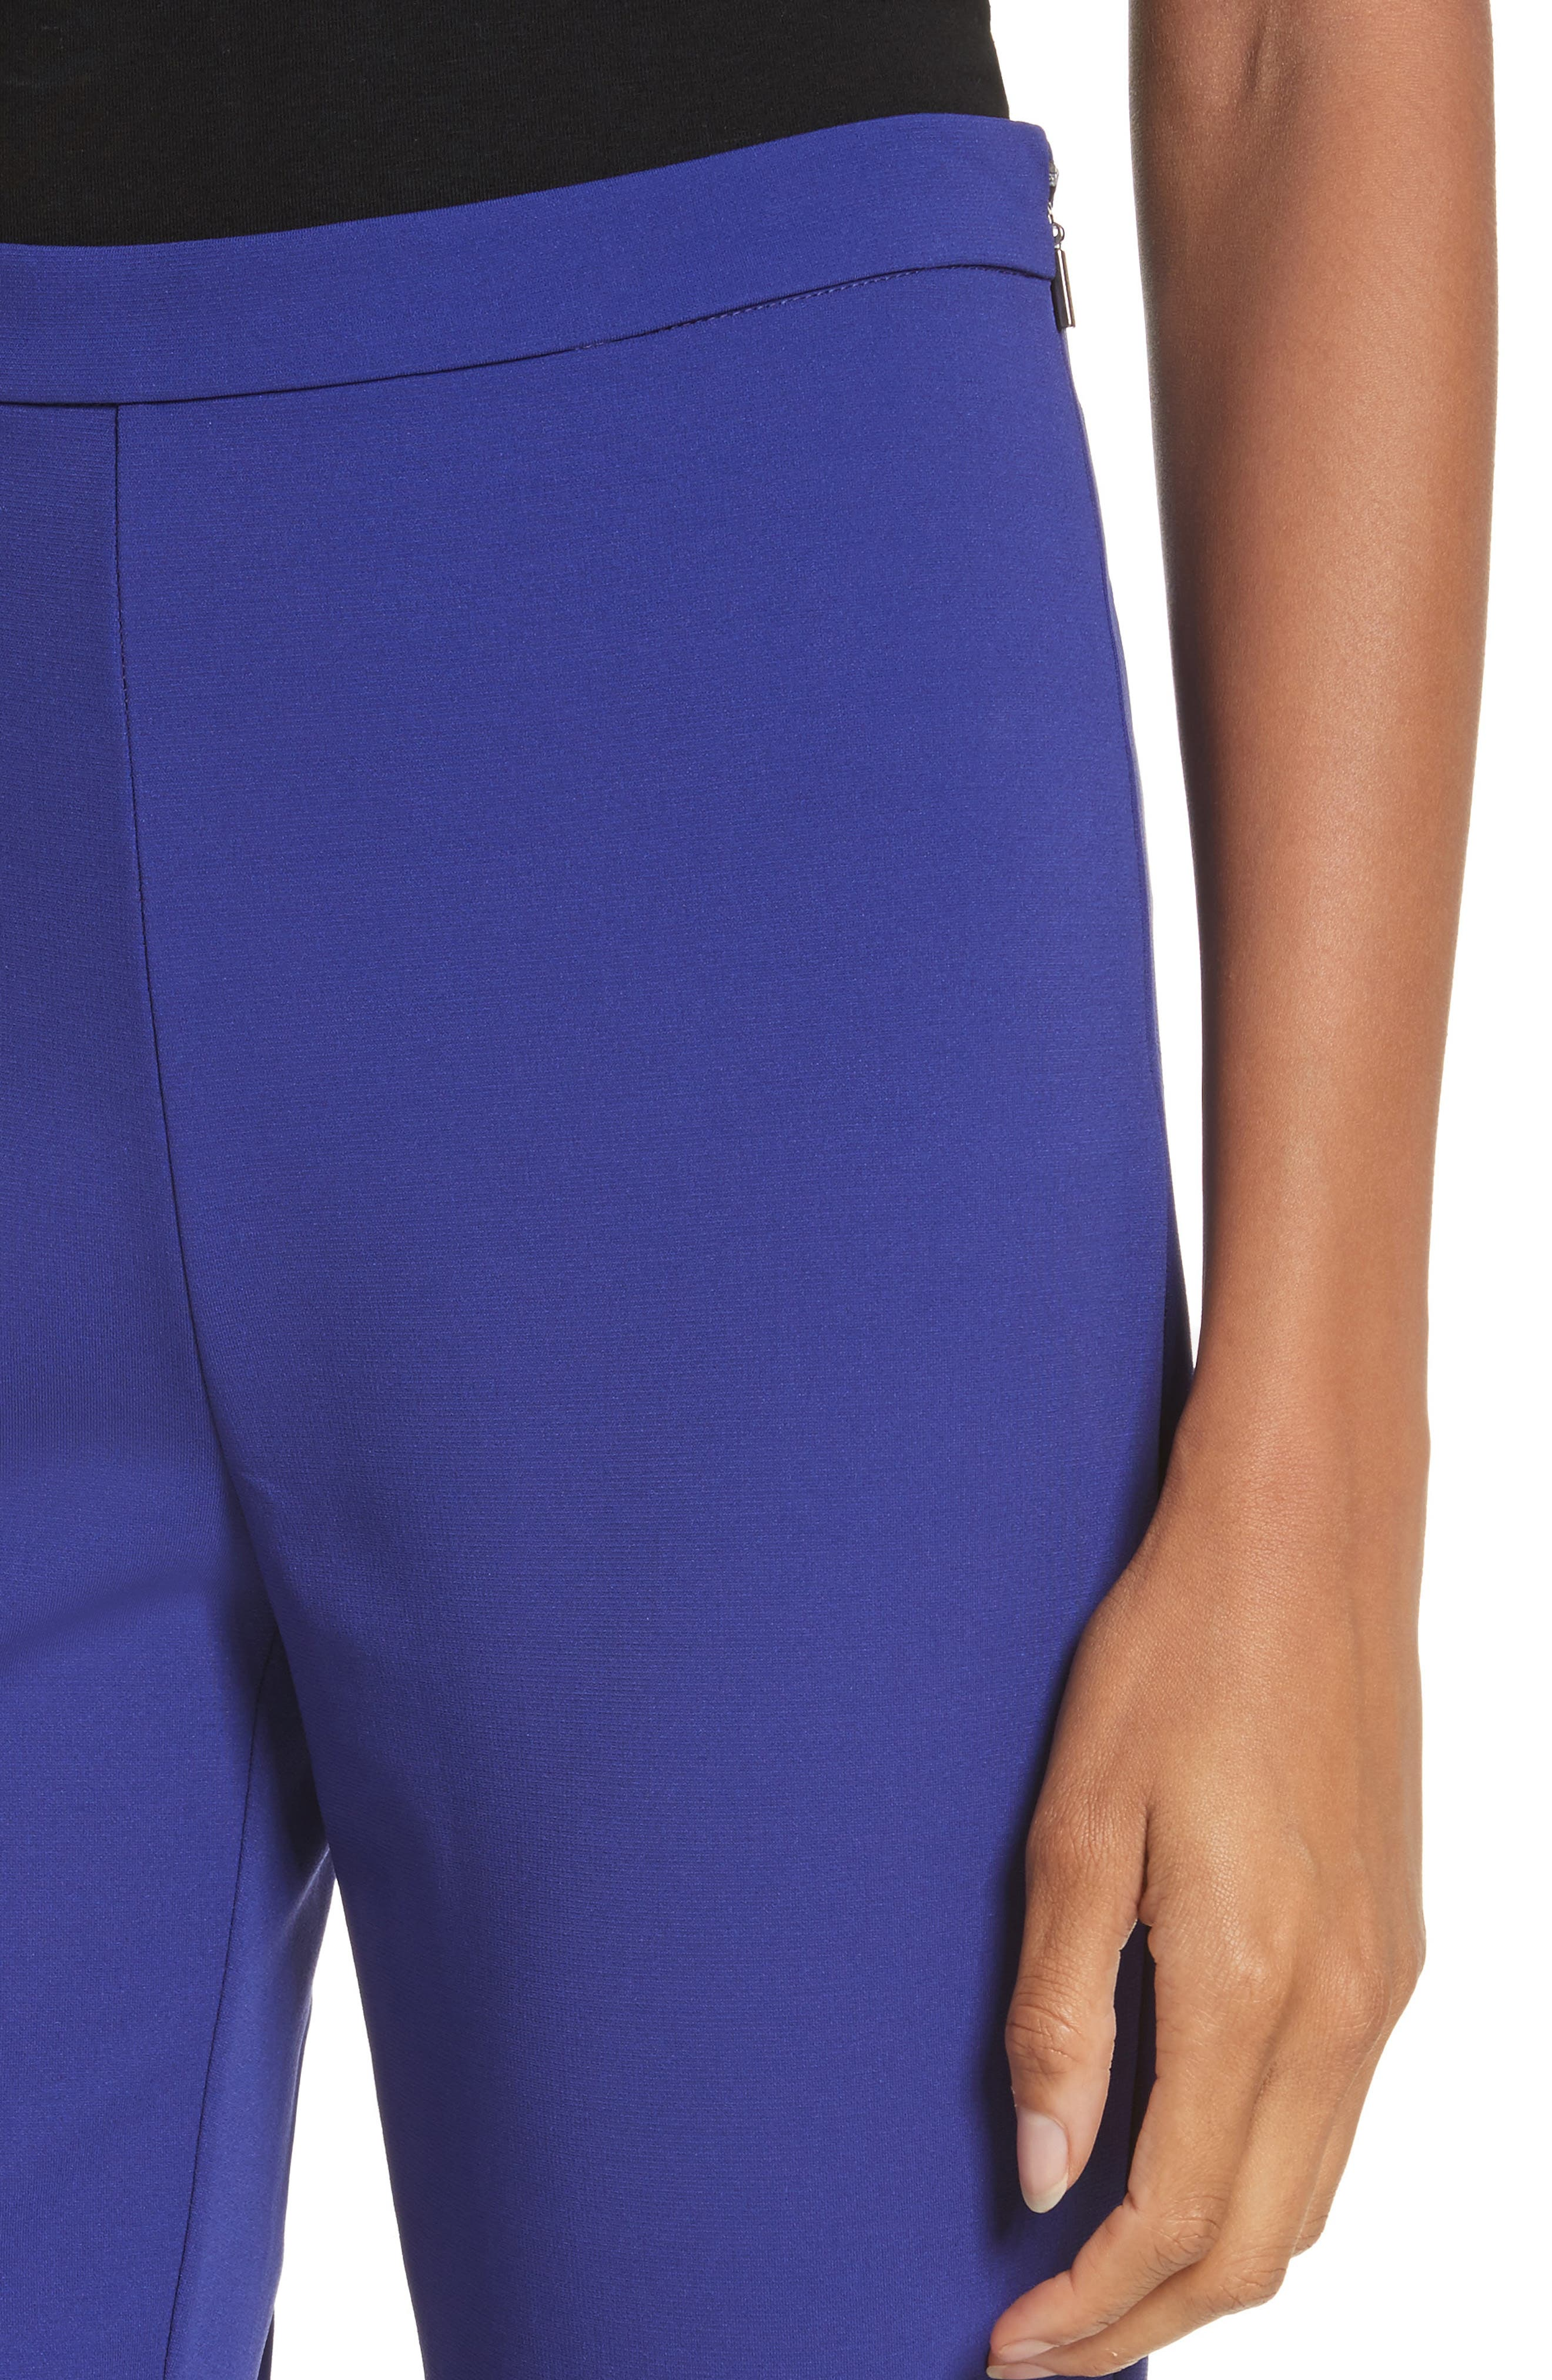 Calerno Crepe Crop Trousers,                             Alternate thumbnail 4, color,                             Violet